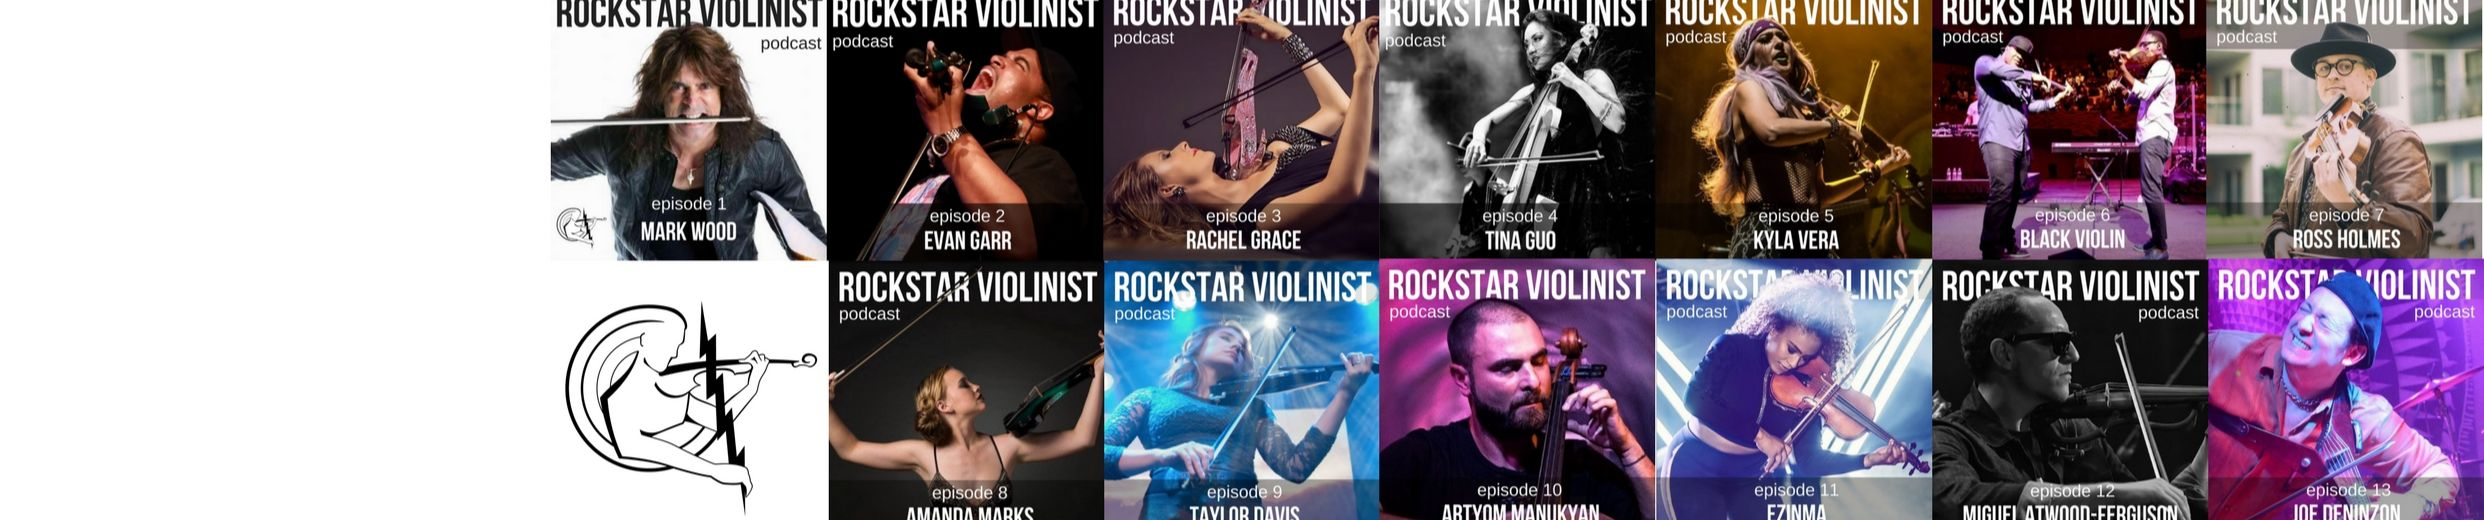 Rockstar Violinist Episode 5: Kyla Vera by Rockstar Violinist